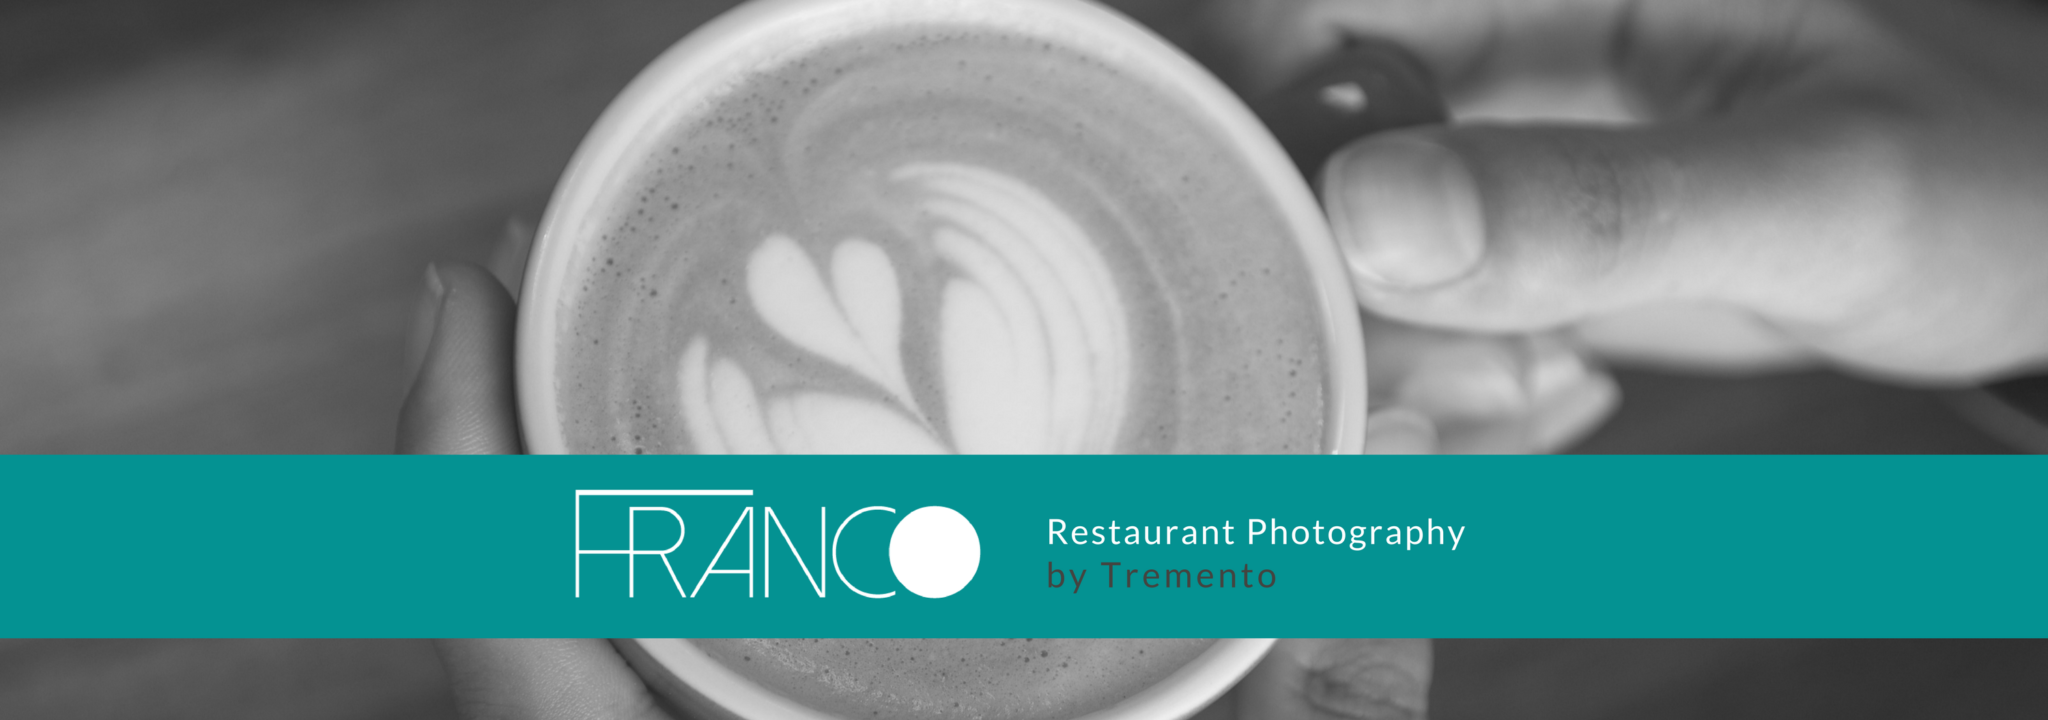 Franco - Restaurant Photography - Hospitality Marketing and Advertising by Tremento